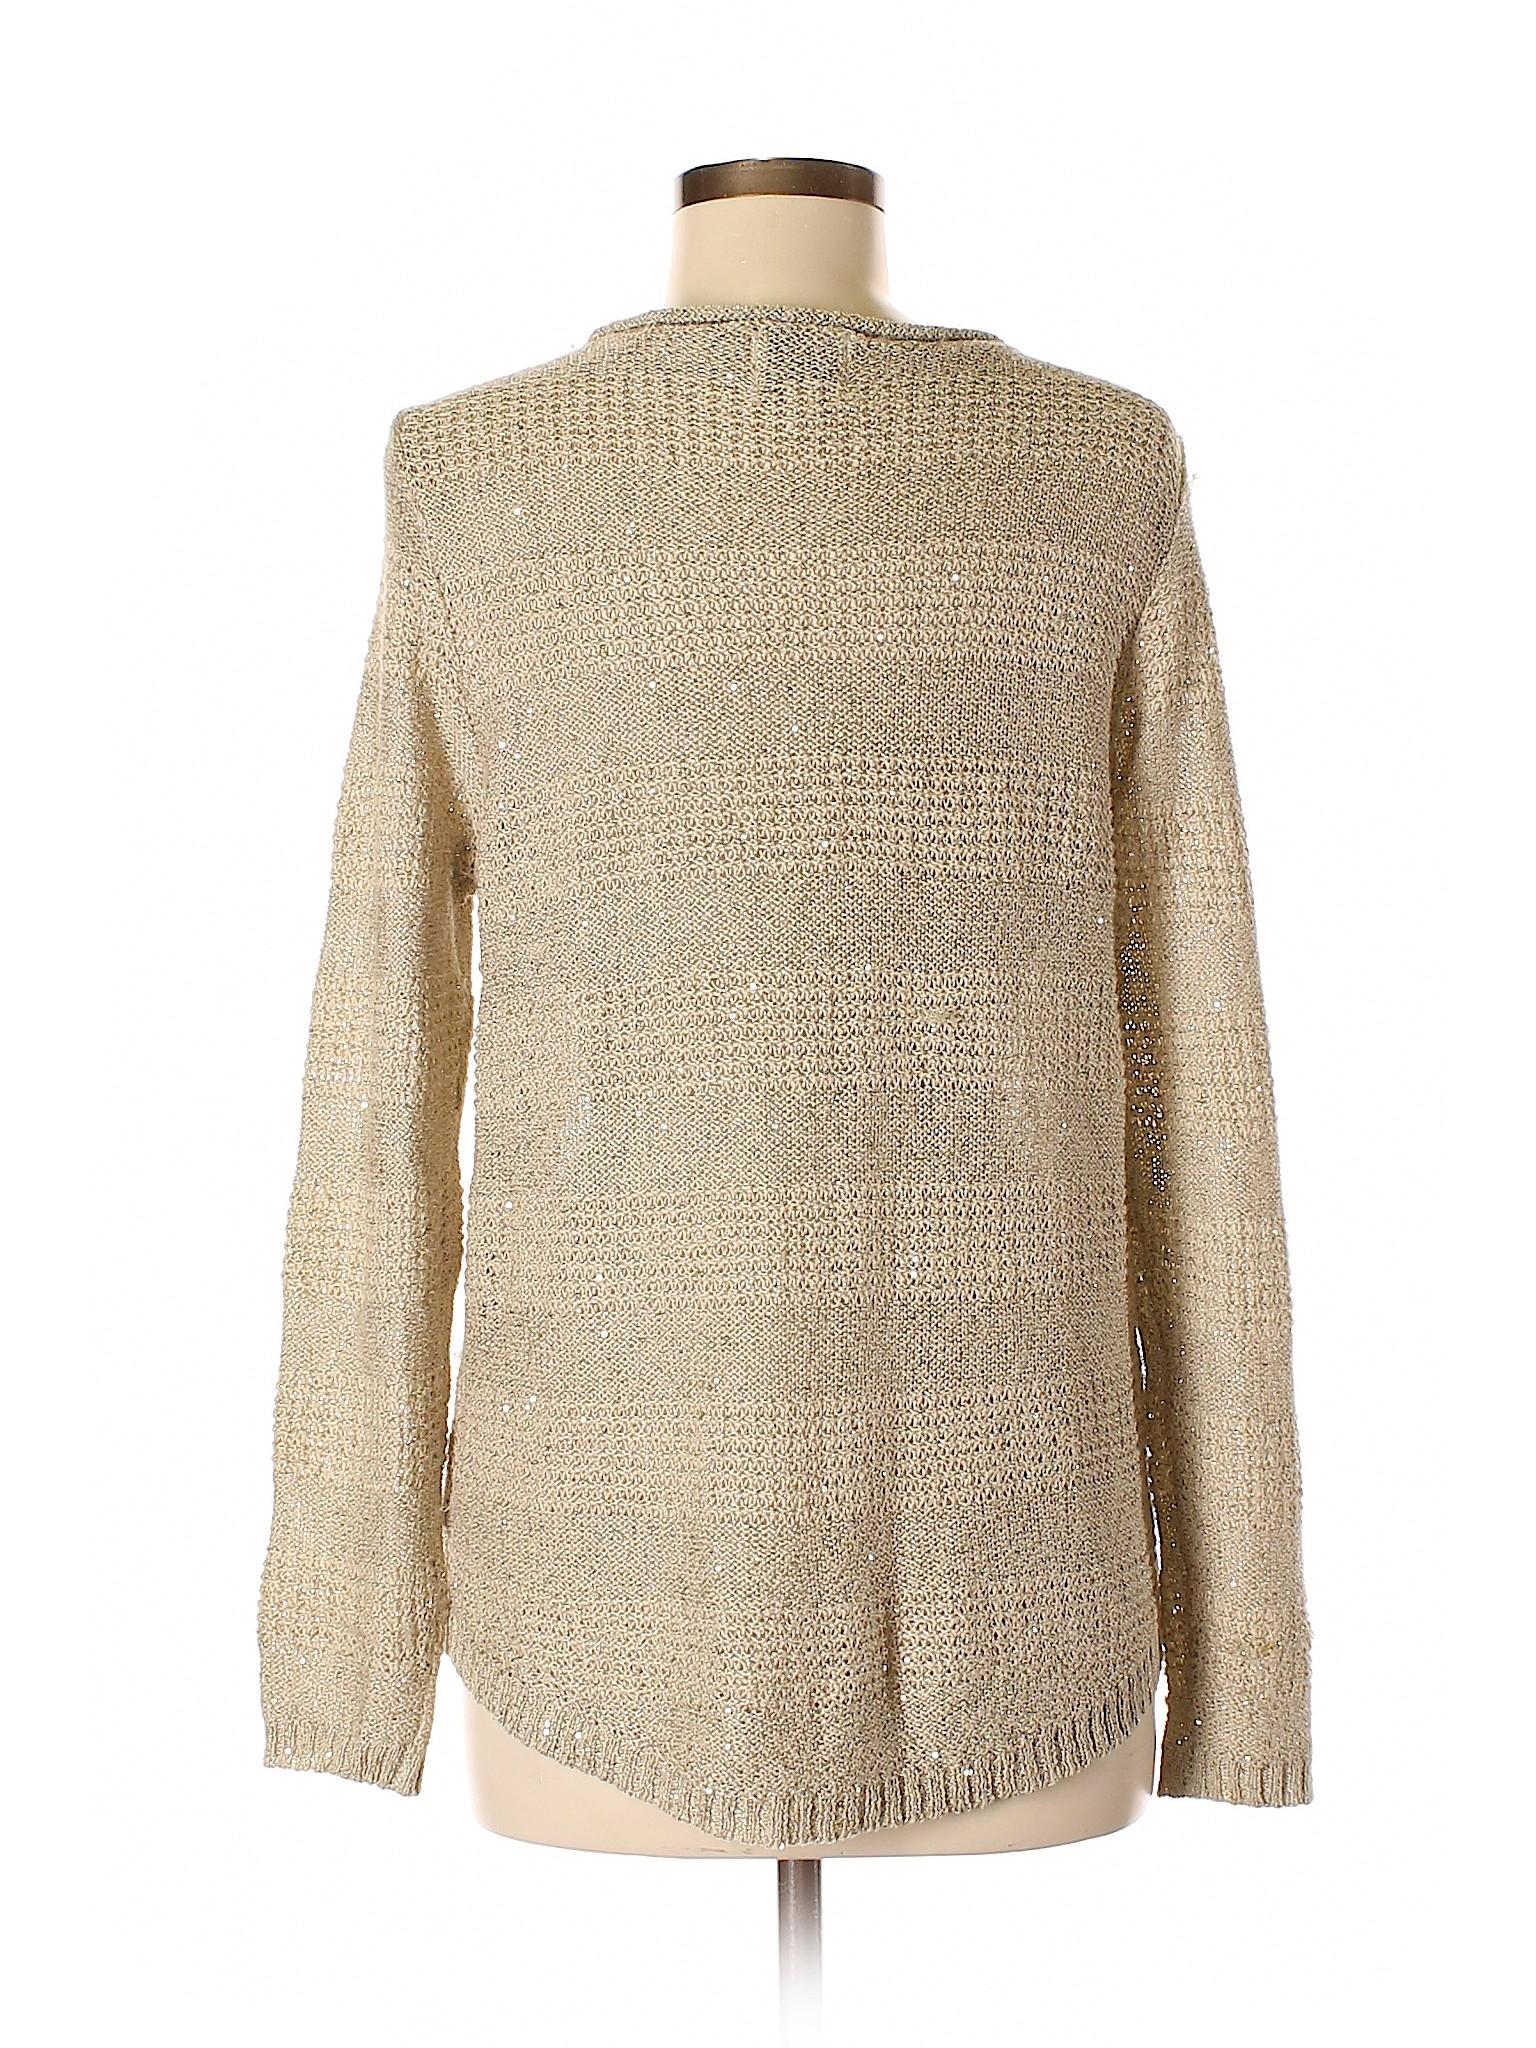 Bay St Pullover Sweater John's Boutique winter q4xPtOwx6